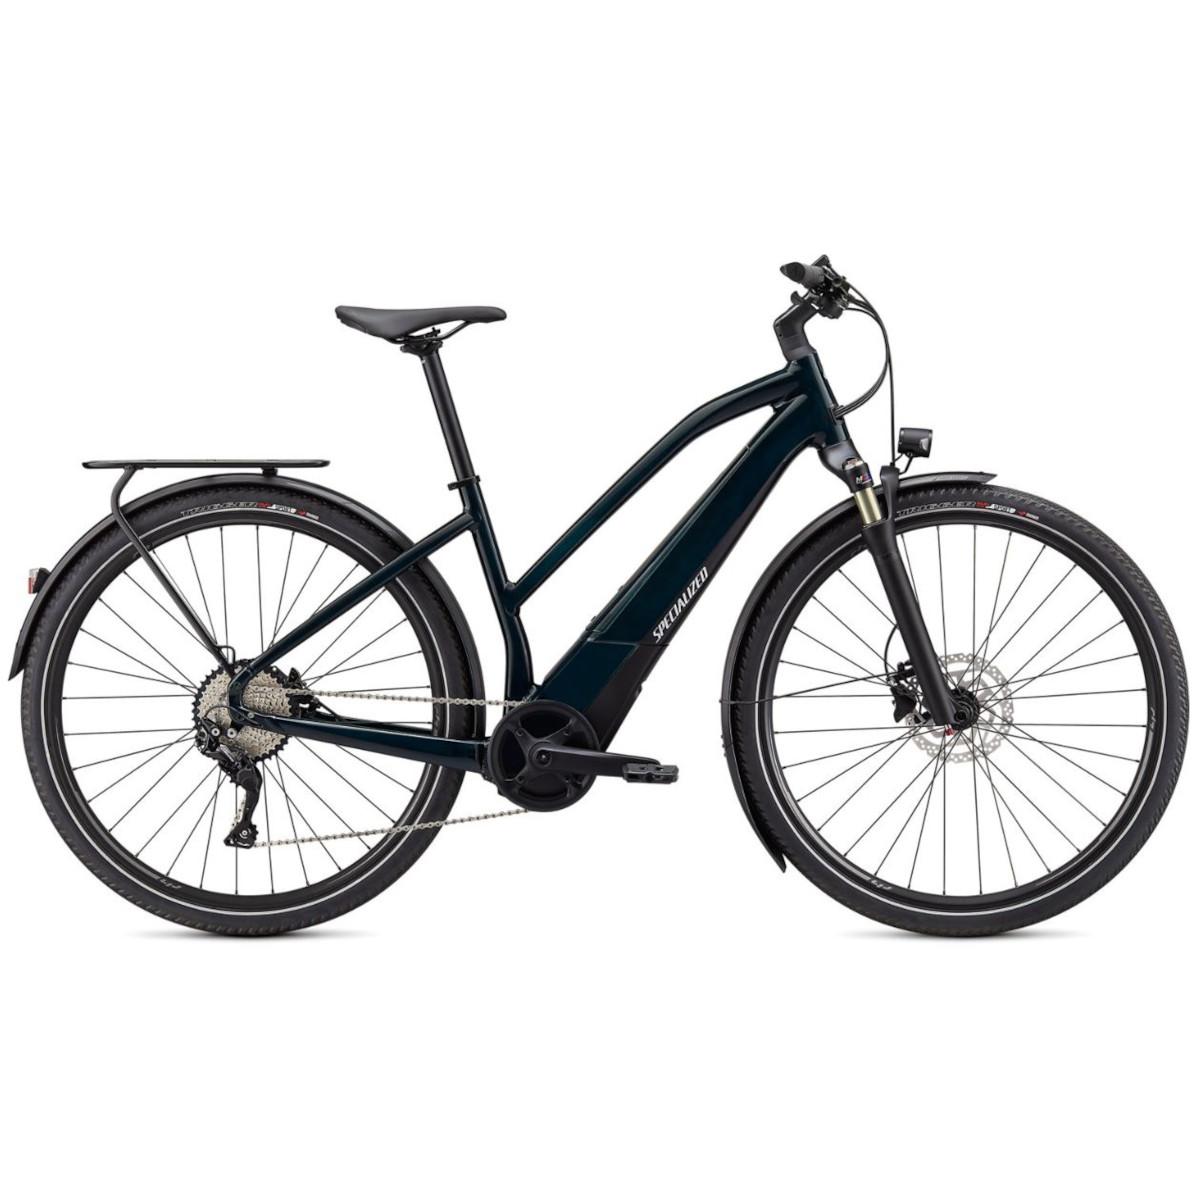 Produktbild von Specialized TURBO VADO 4.0 Step-Through E-Bike - 2021 - forest green / black / liquid silver